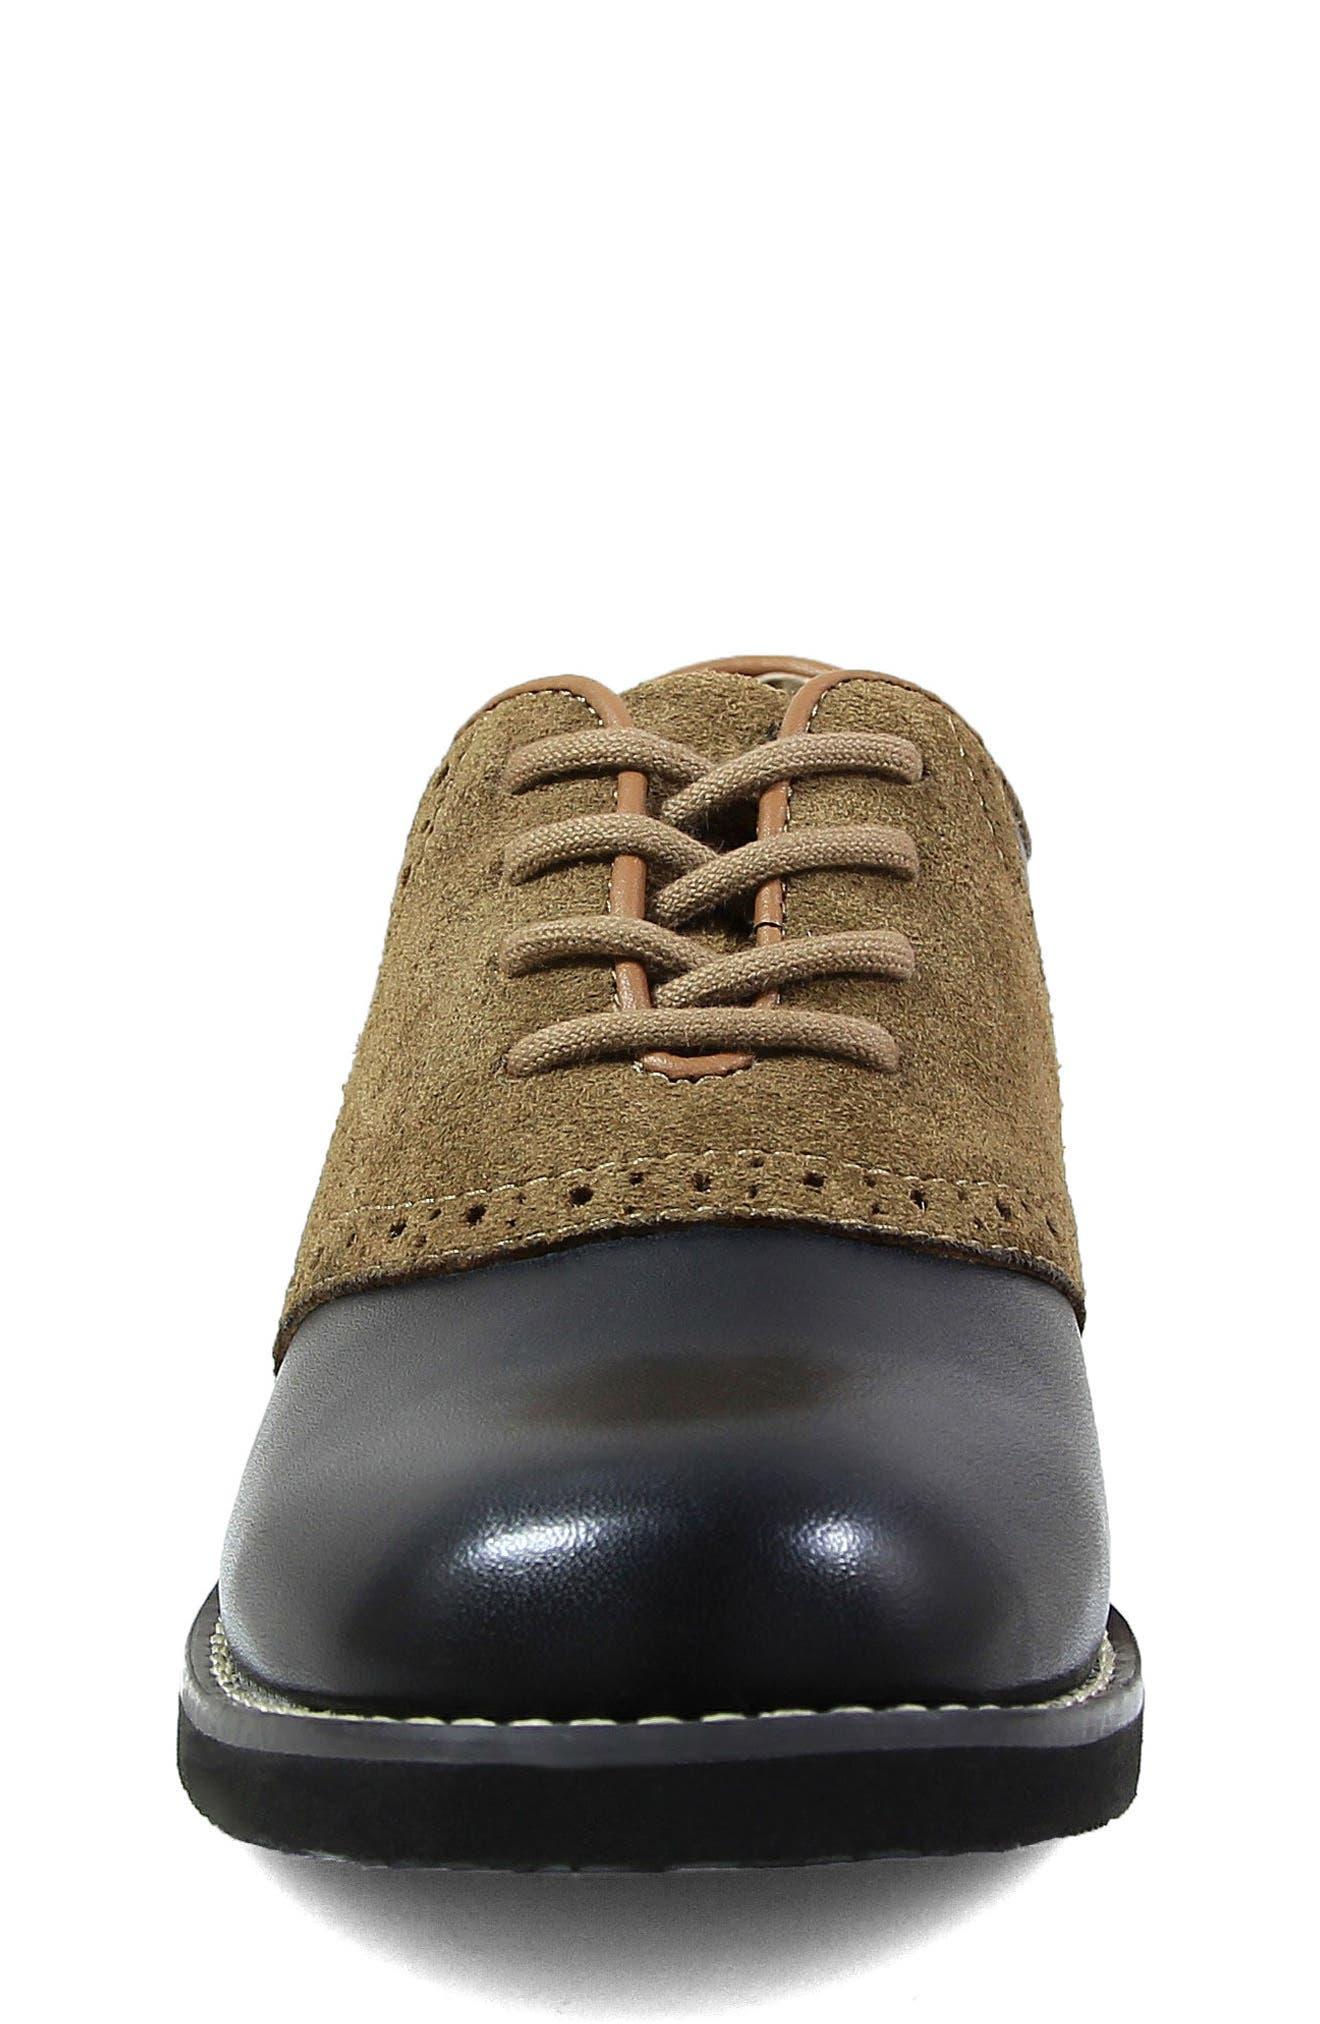 'Kennett Jr. II' Saddle Shoe,                             Alternate thumbnail 3, color,                             SMOOTH BLACK W/ MOCHA SUEDE